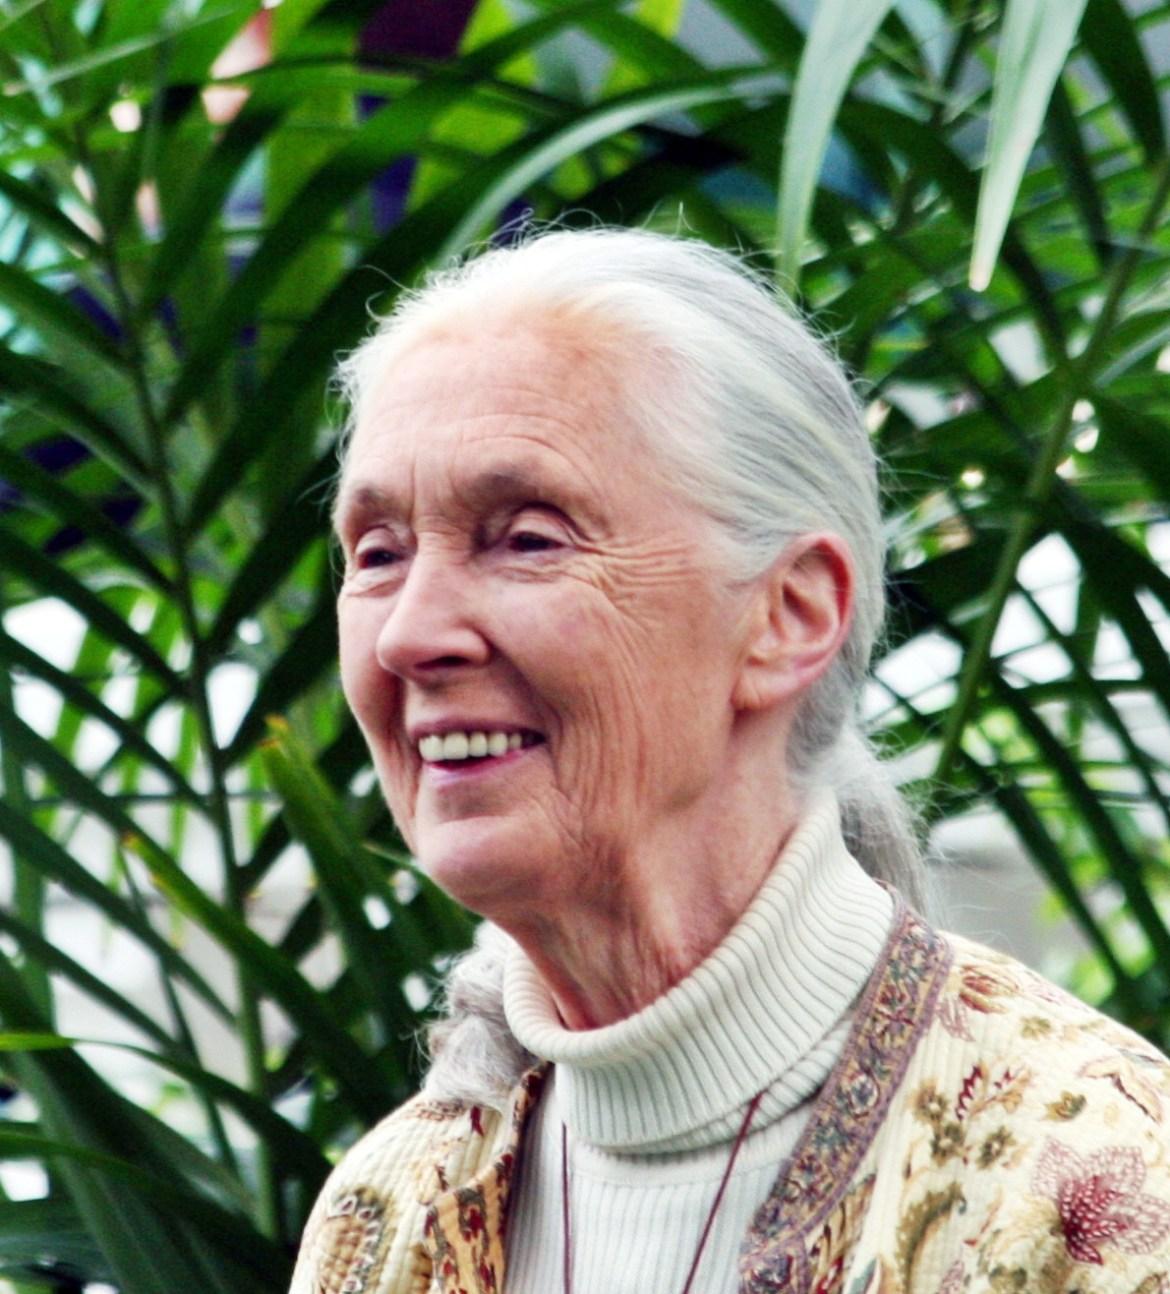 Jane Goodall Trophäenjäger bedrohen gefährdete Tiere